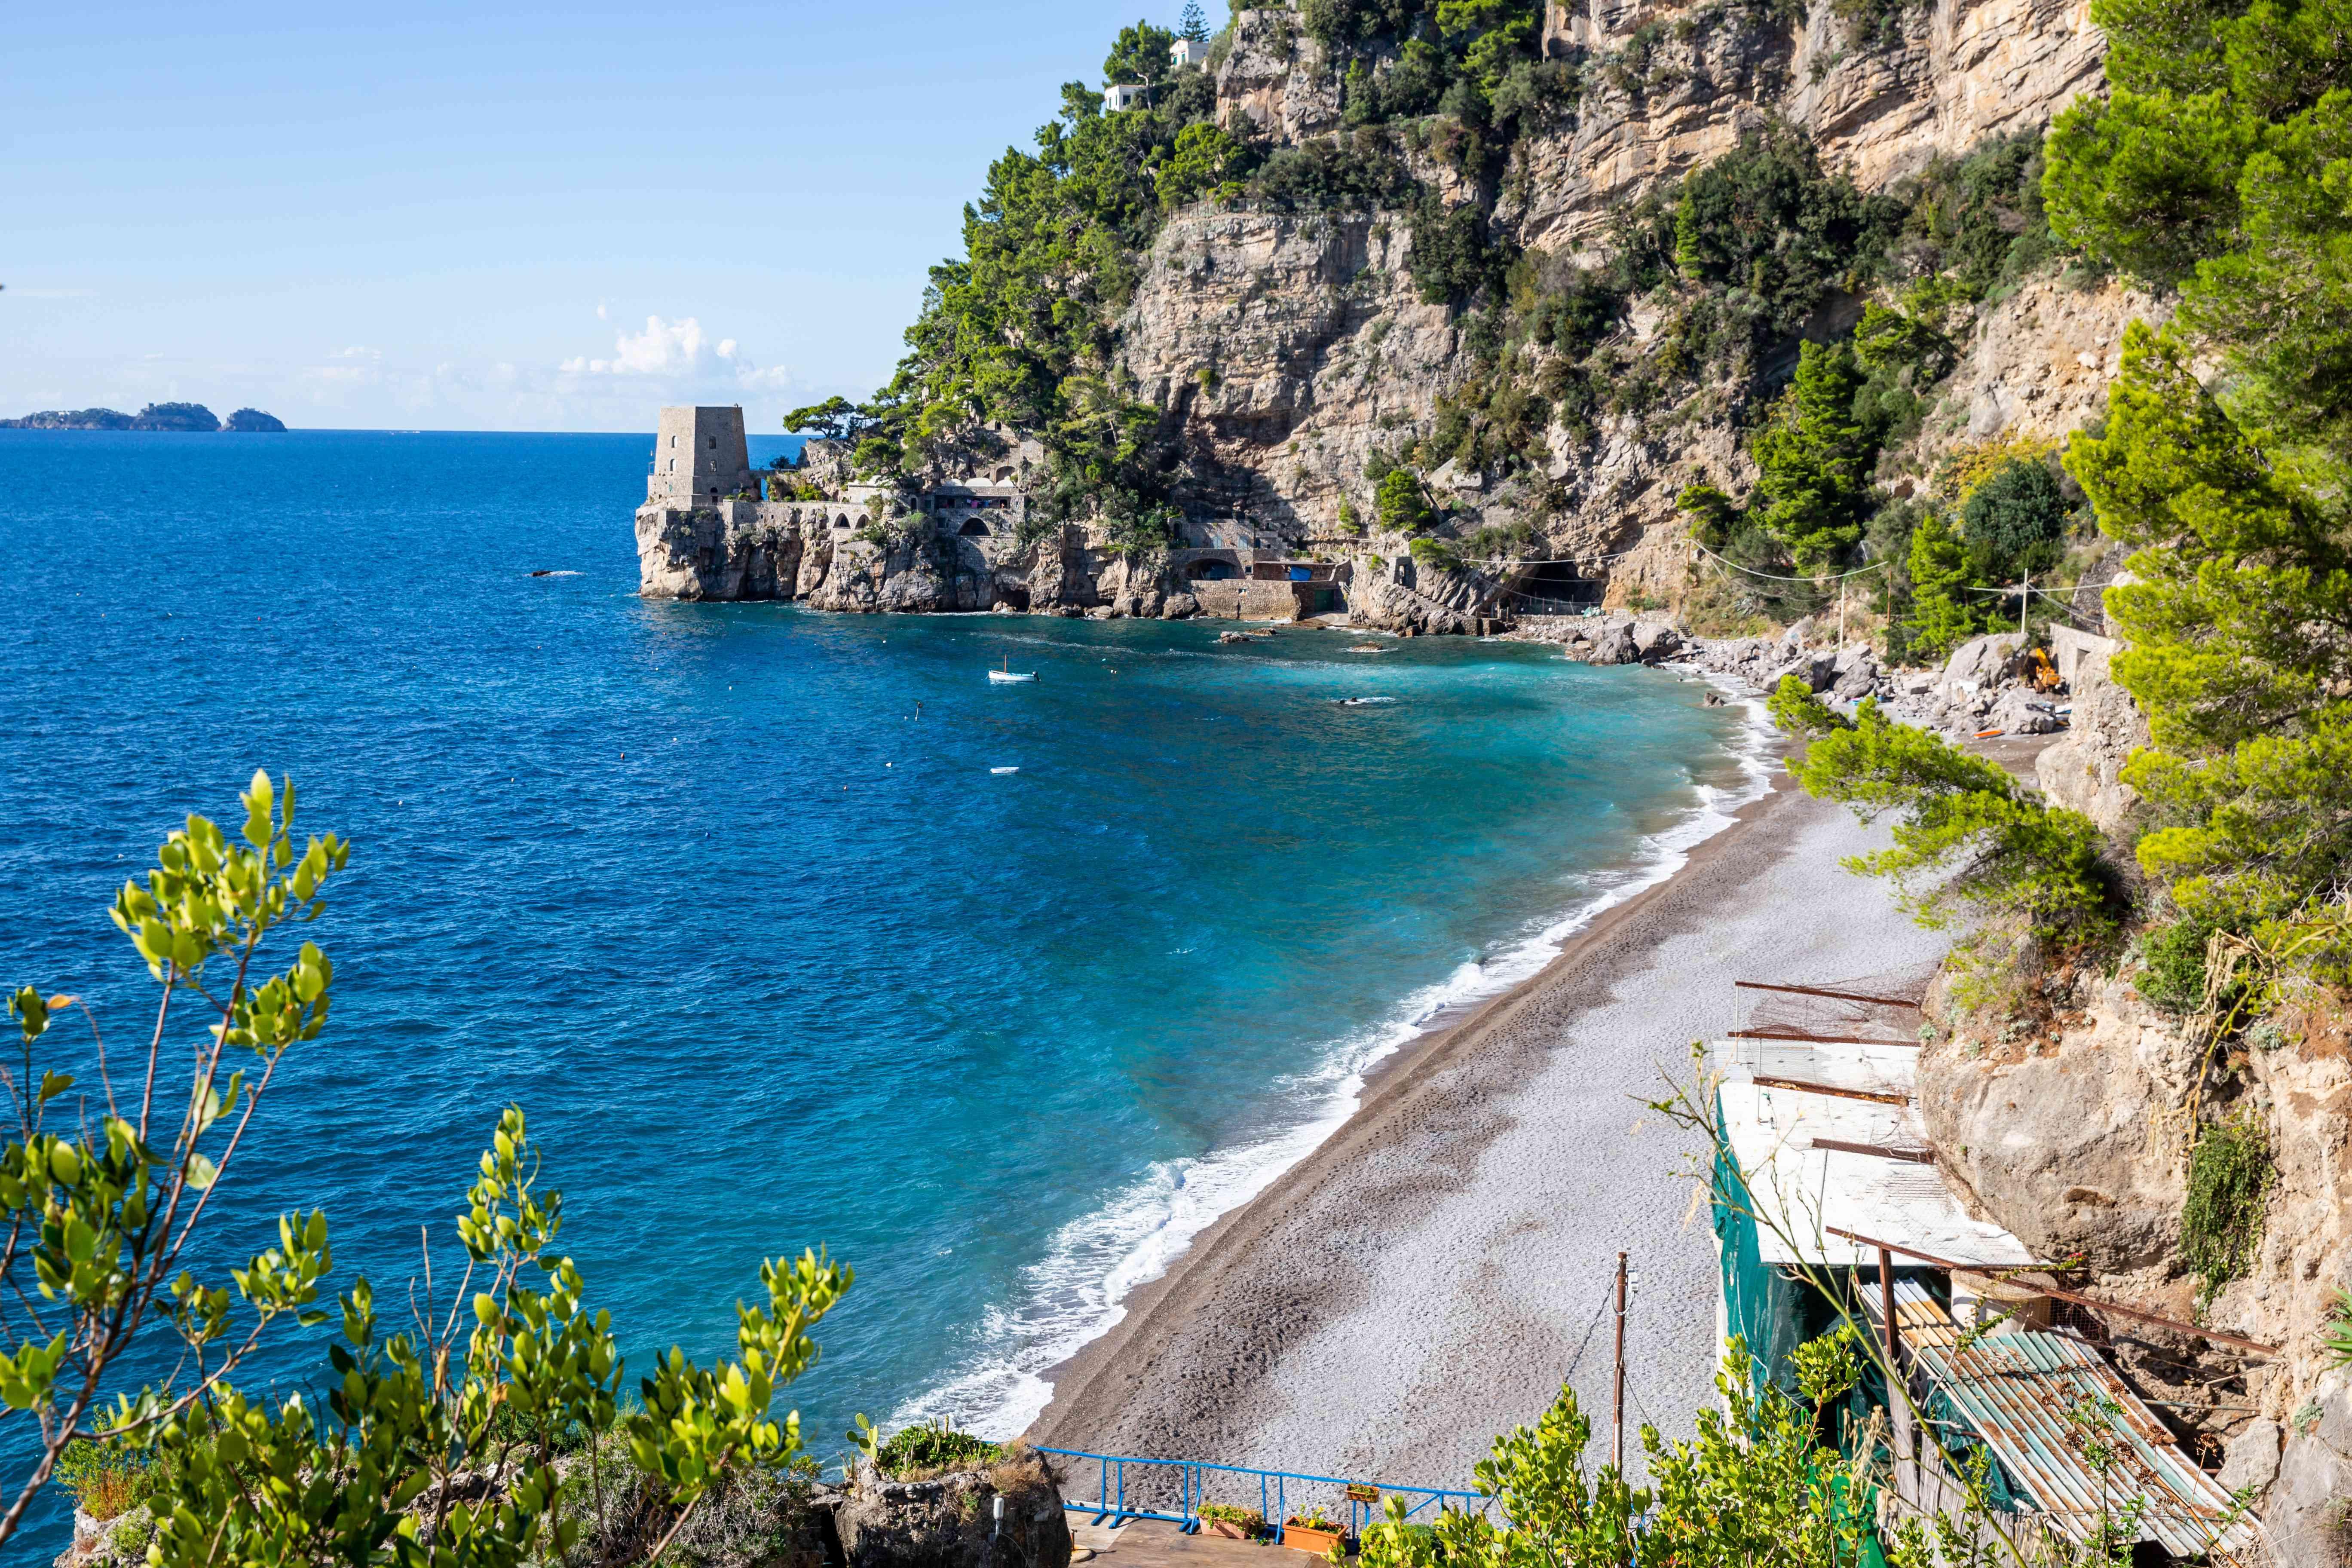 Fornillo Beach, Positano, Amalfi Coast